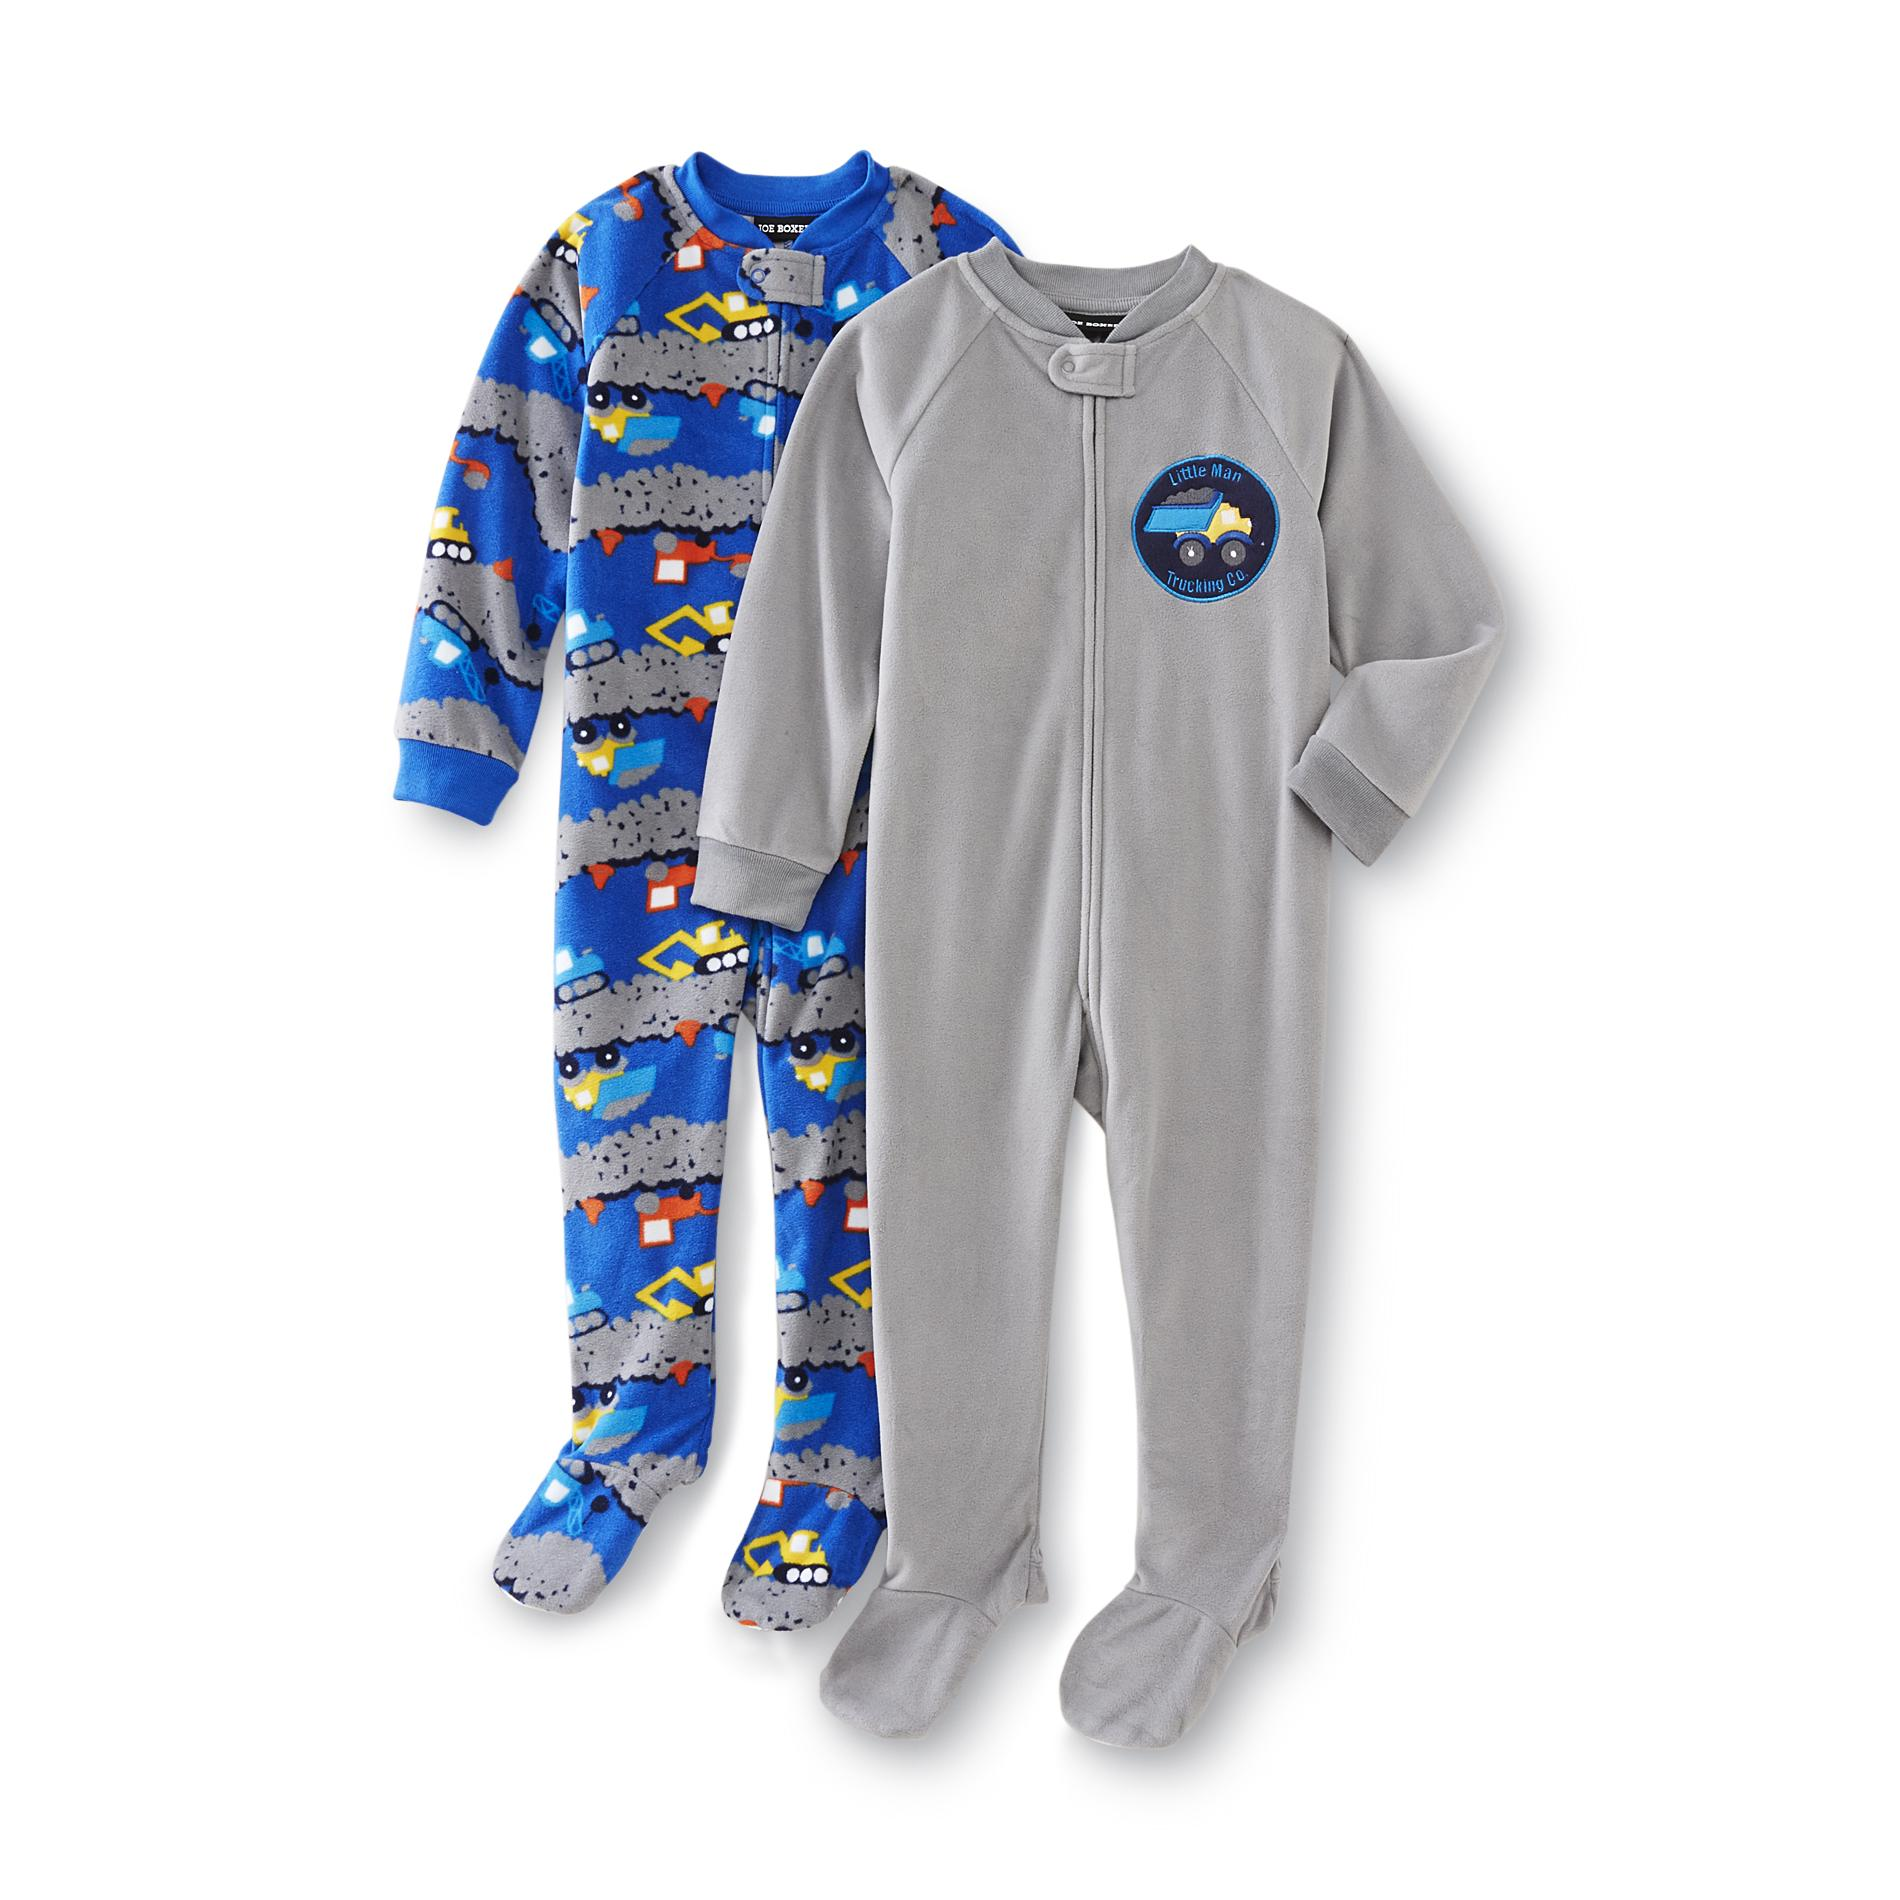 Joe Boxer Infant & Toddler Boy's 2-Pack Sleeper Pajamas - Truck Print